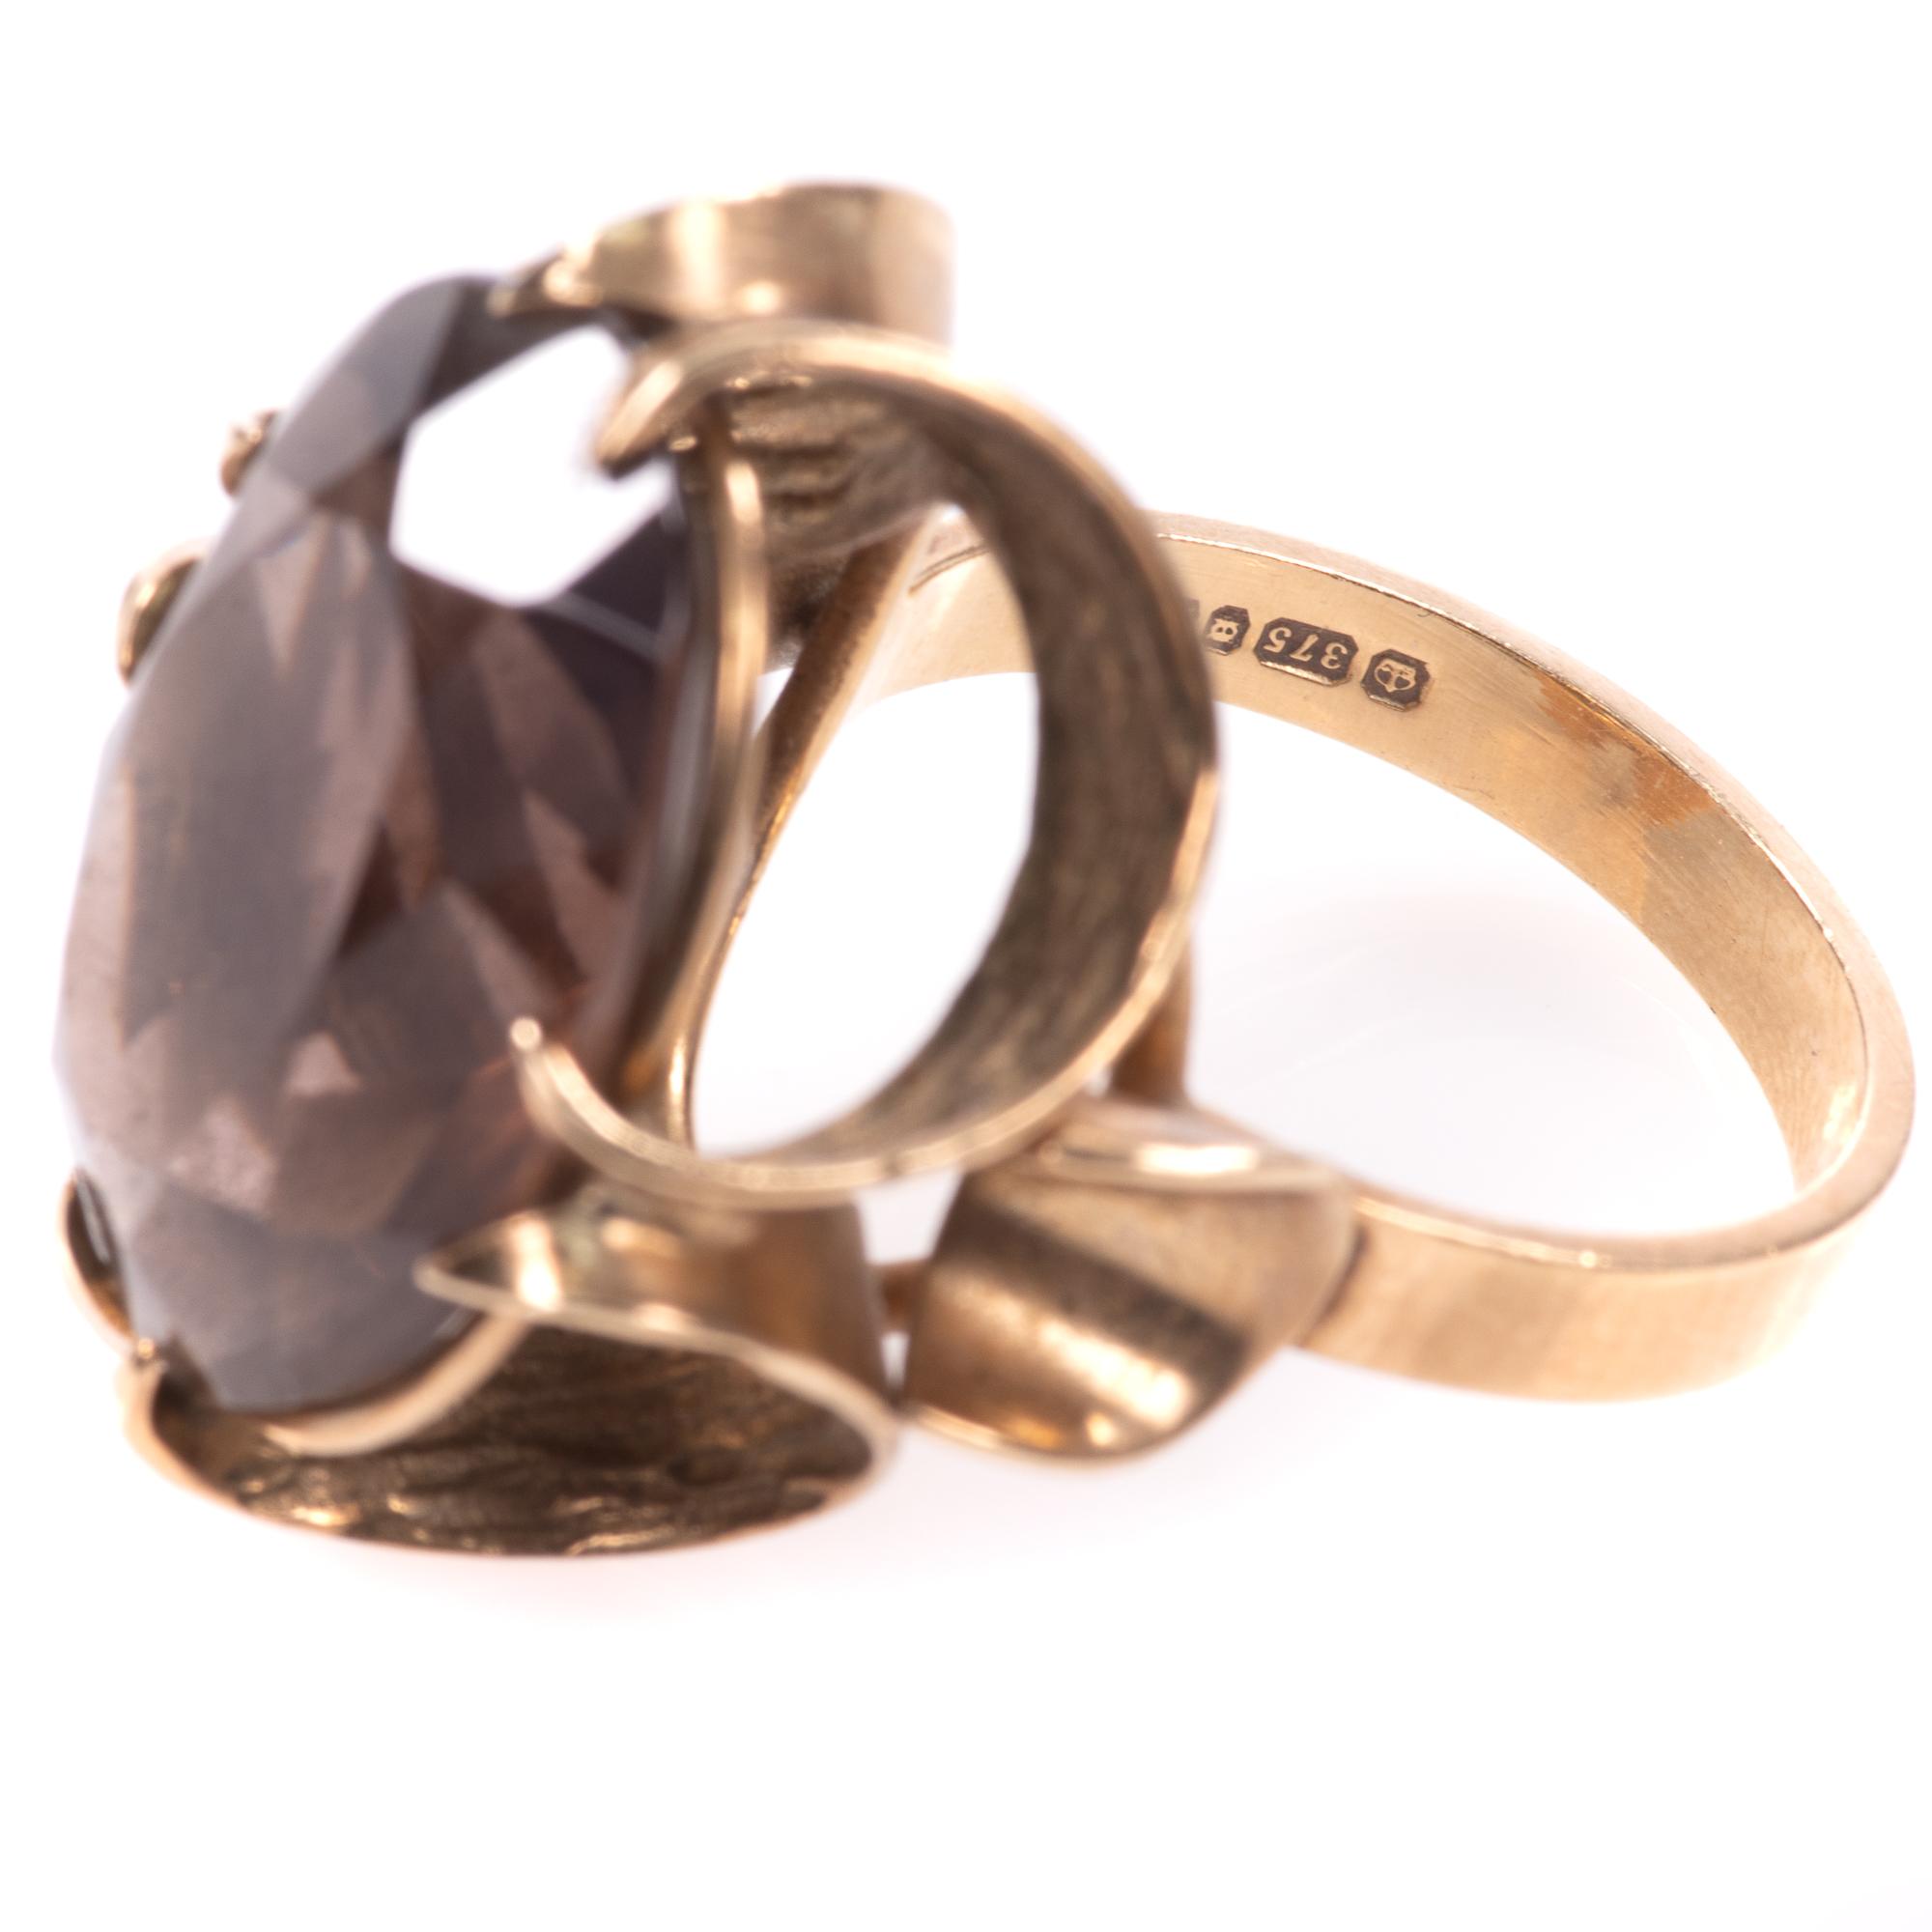 9ct Gold 12.75ct Smoky Quartz Ring - Image 7 of 7